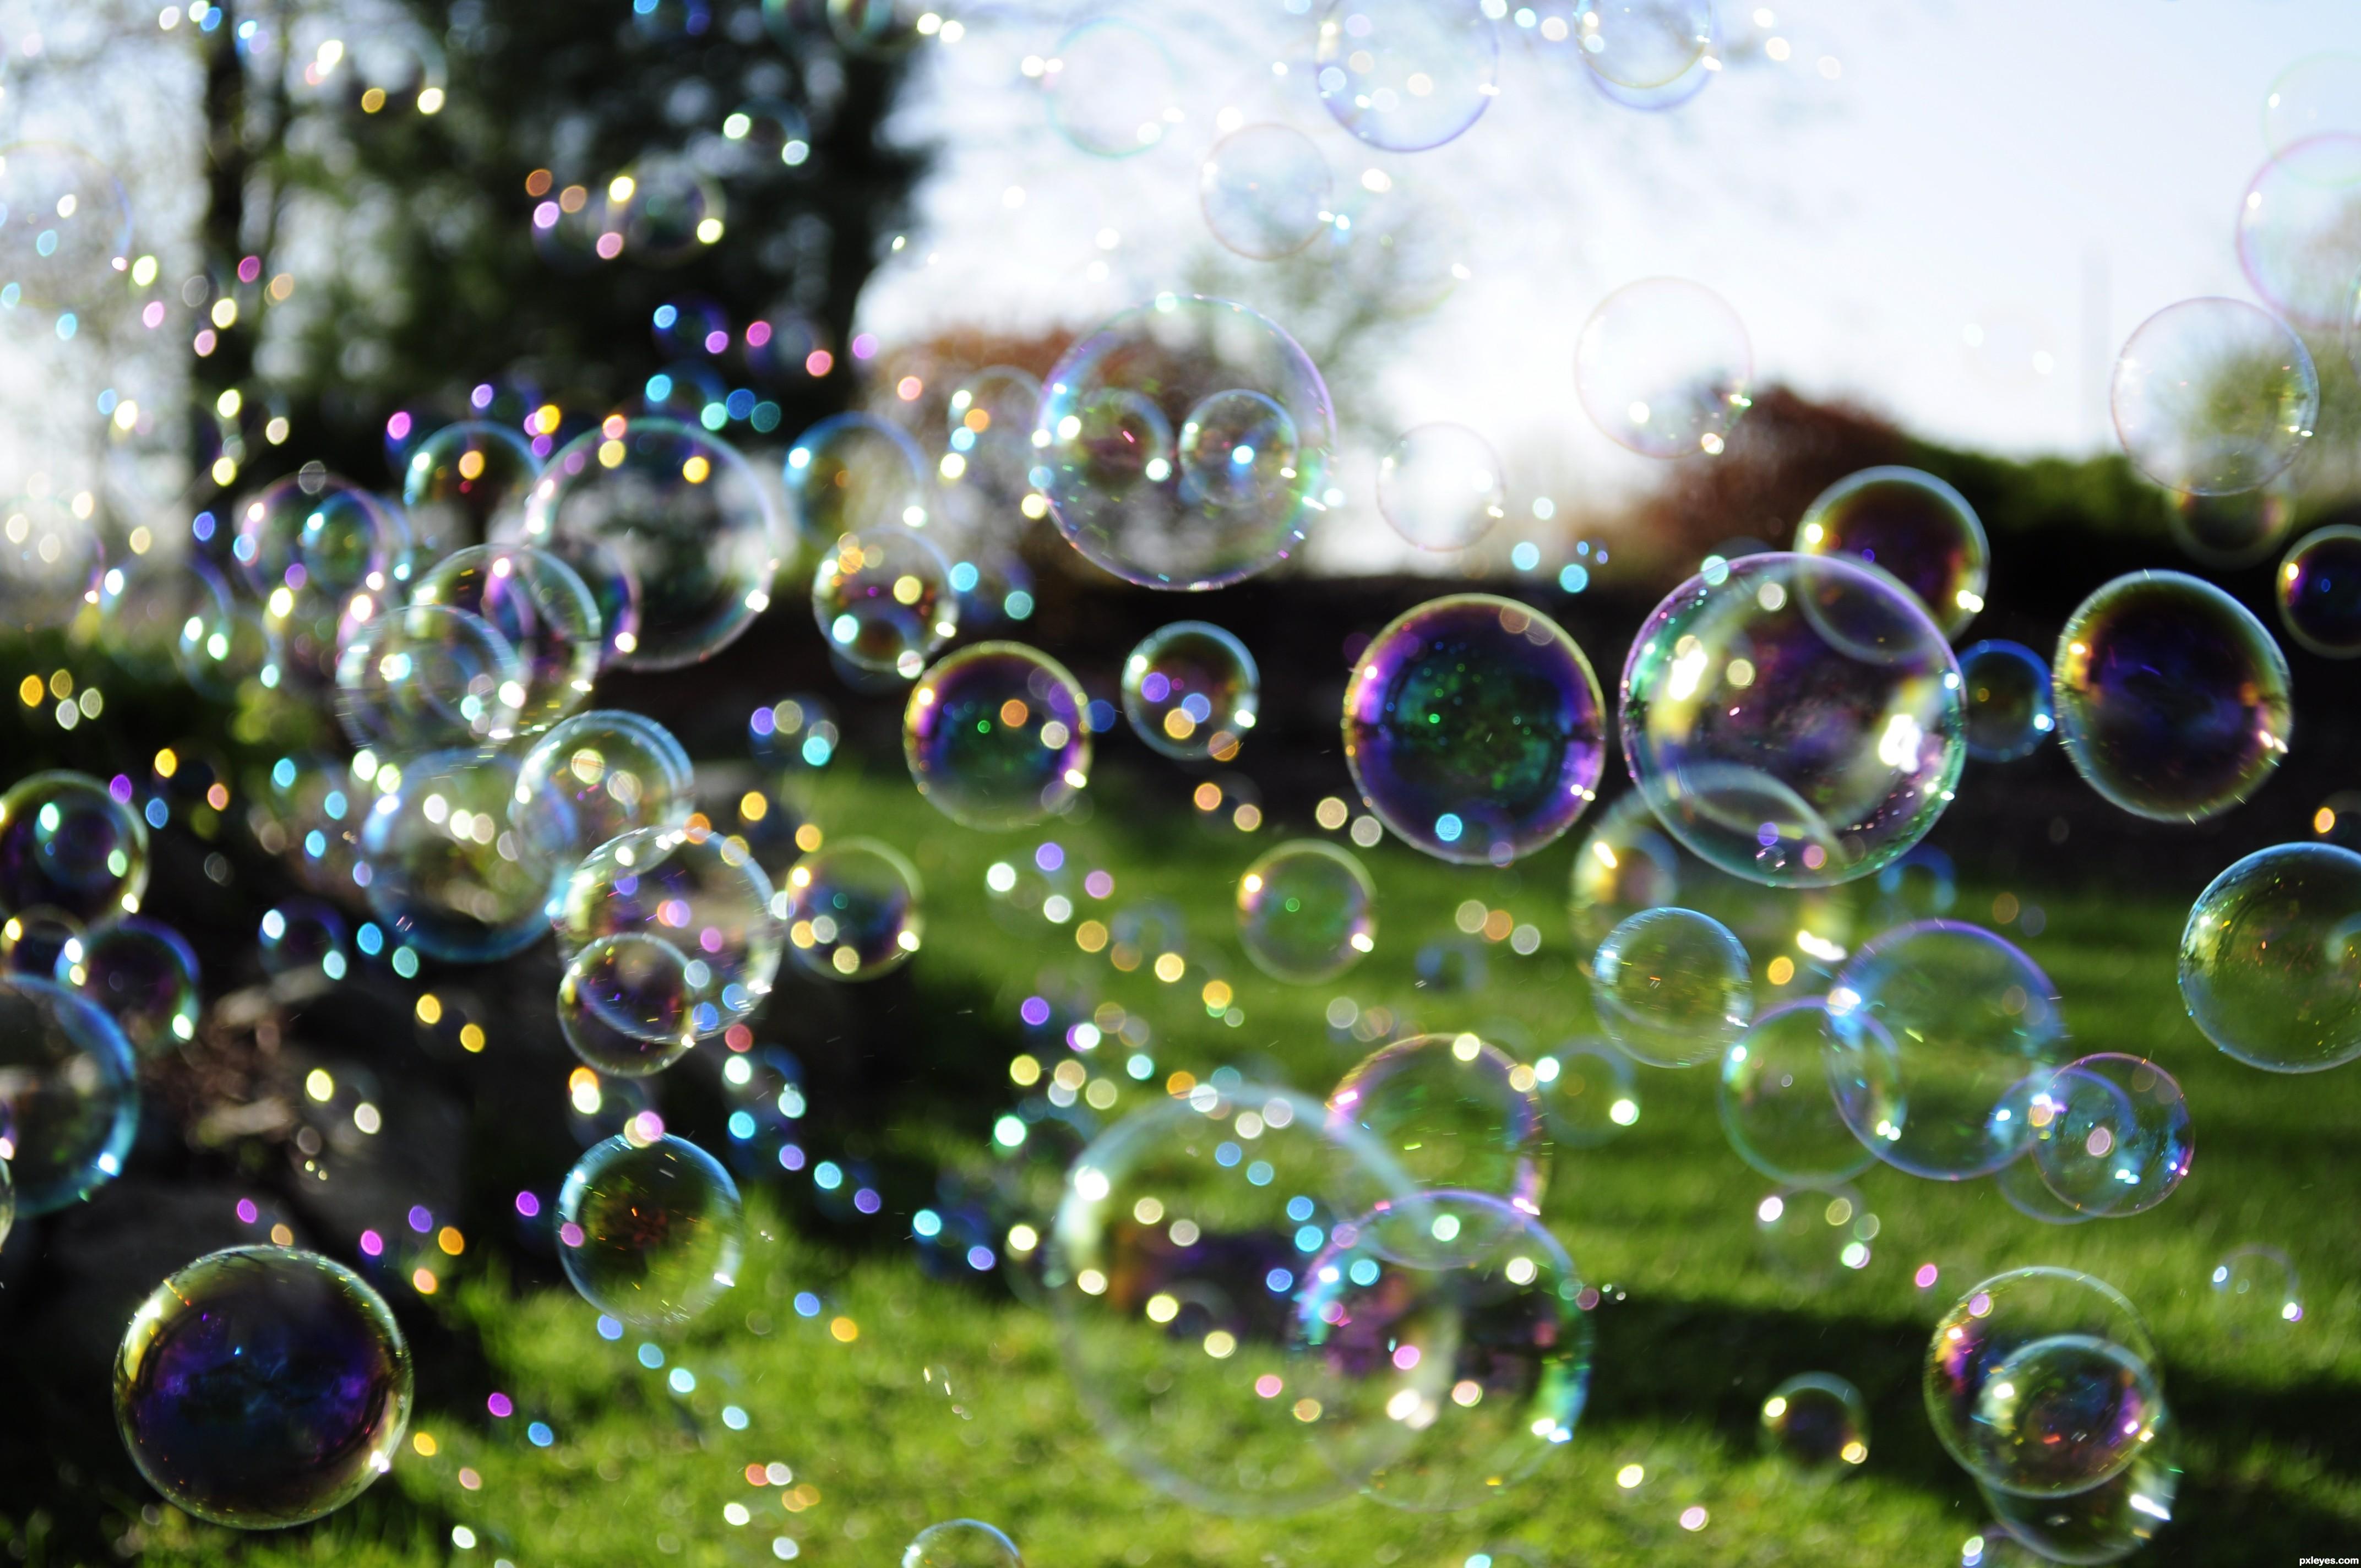 Bubbles images Bubbles HD wallpaper and background photos (40143299)